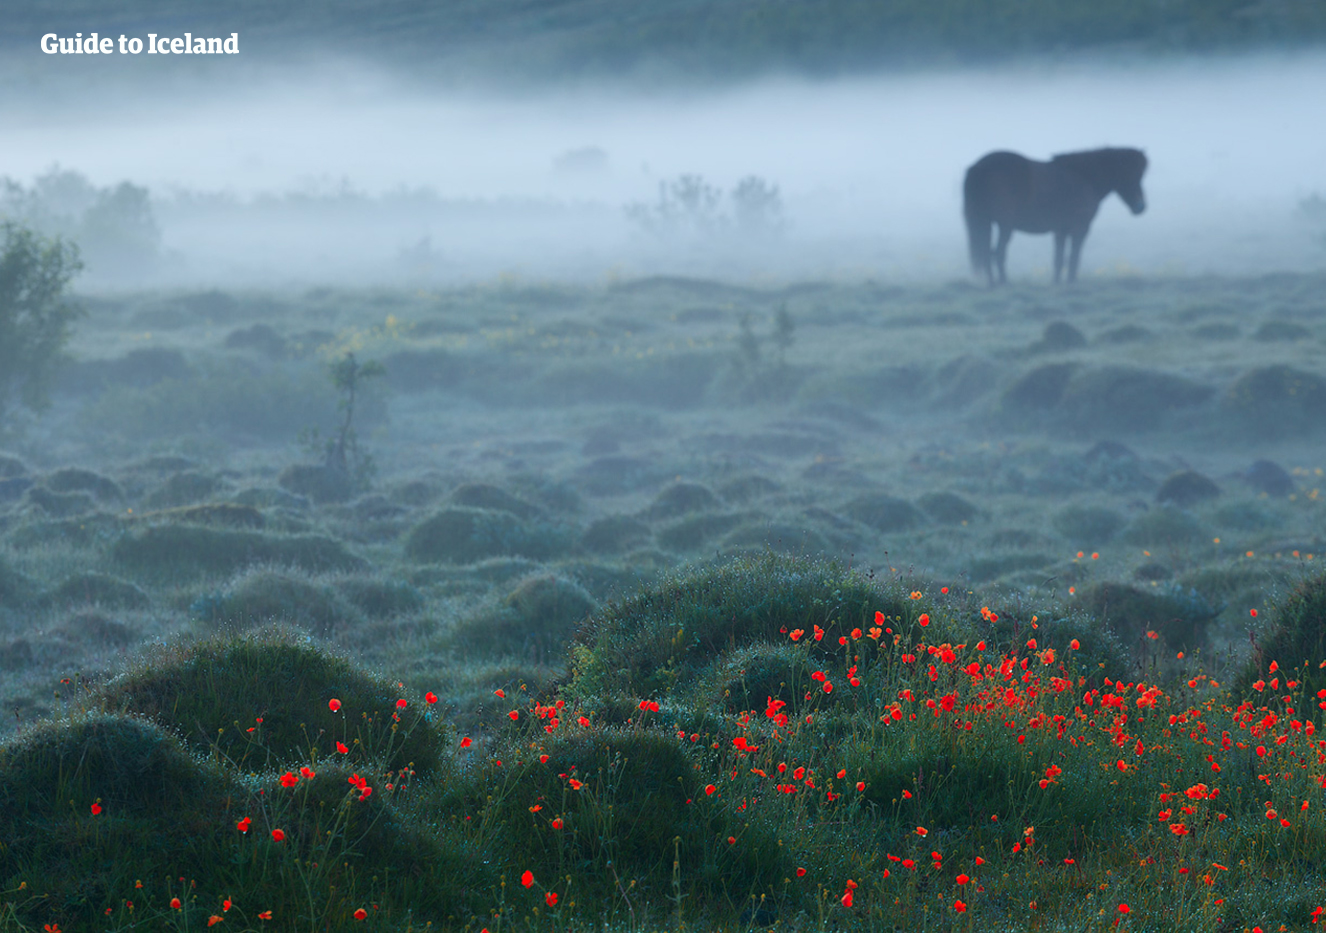 Puedes unirte a un tour a caballo mientras viajas por Islandia.